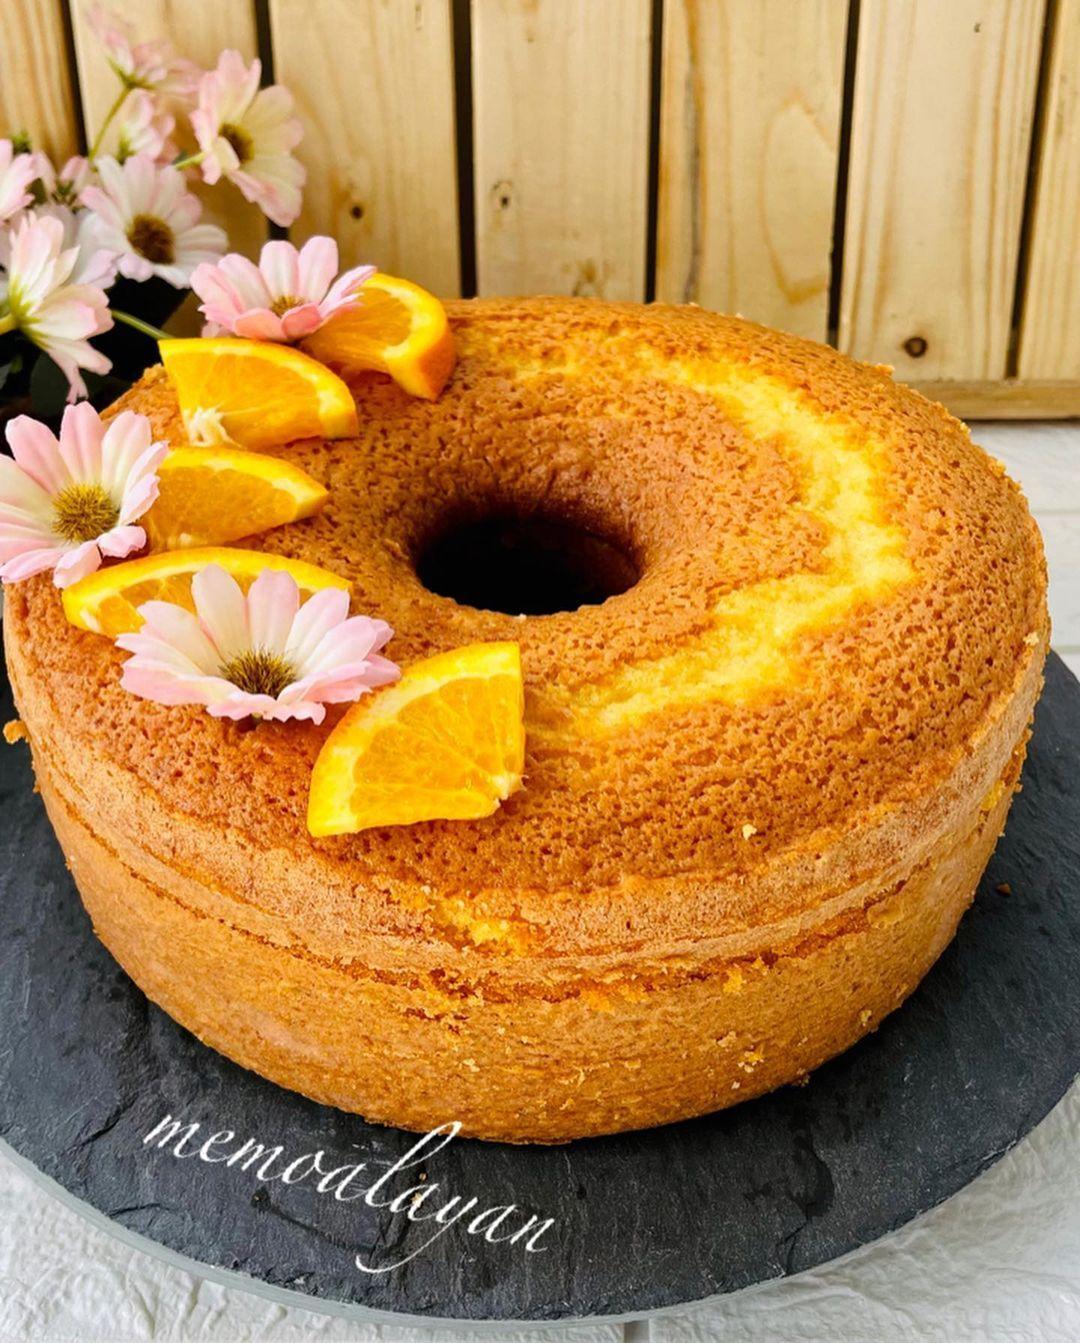 Memo Alayan On Instagram وصفة اليوم كيك البرتقال من اطيب وصفات صراحة كثير طيب وكثير هش يلا منشن لرفقاتكن لينضمو النا ع صفحة ل In 2021 Dessert Recipes Desserts Food